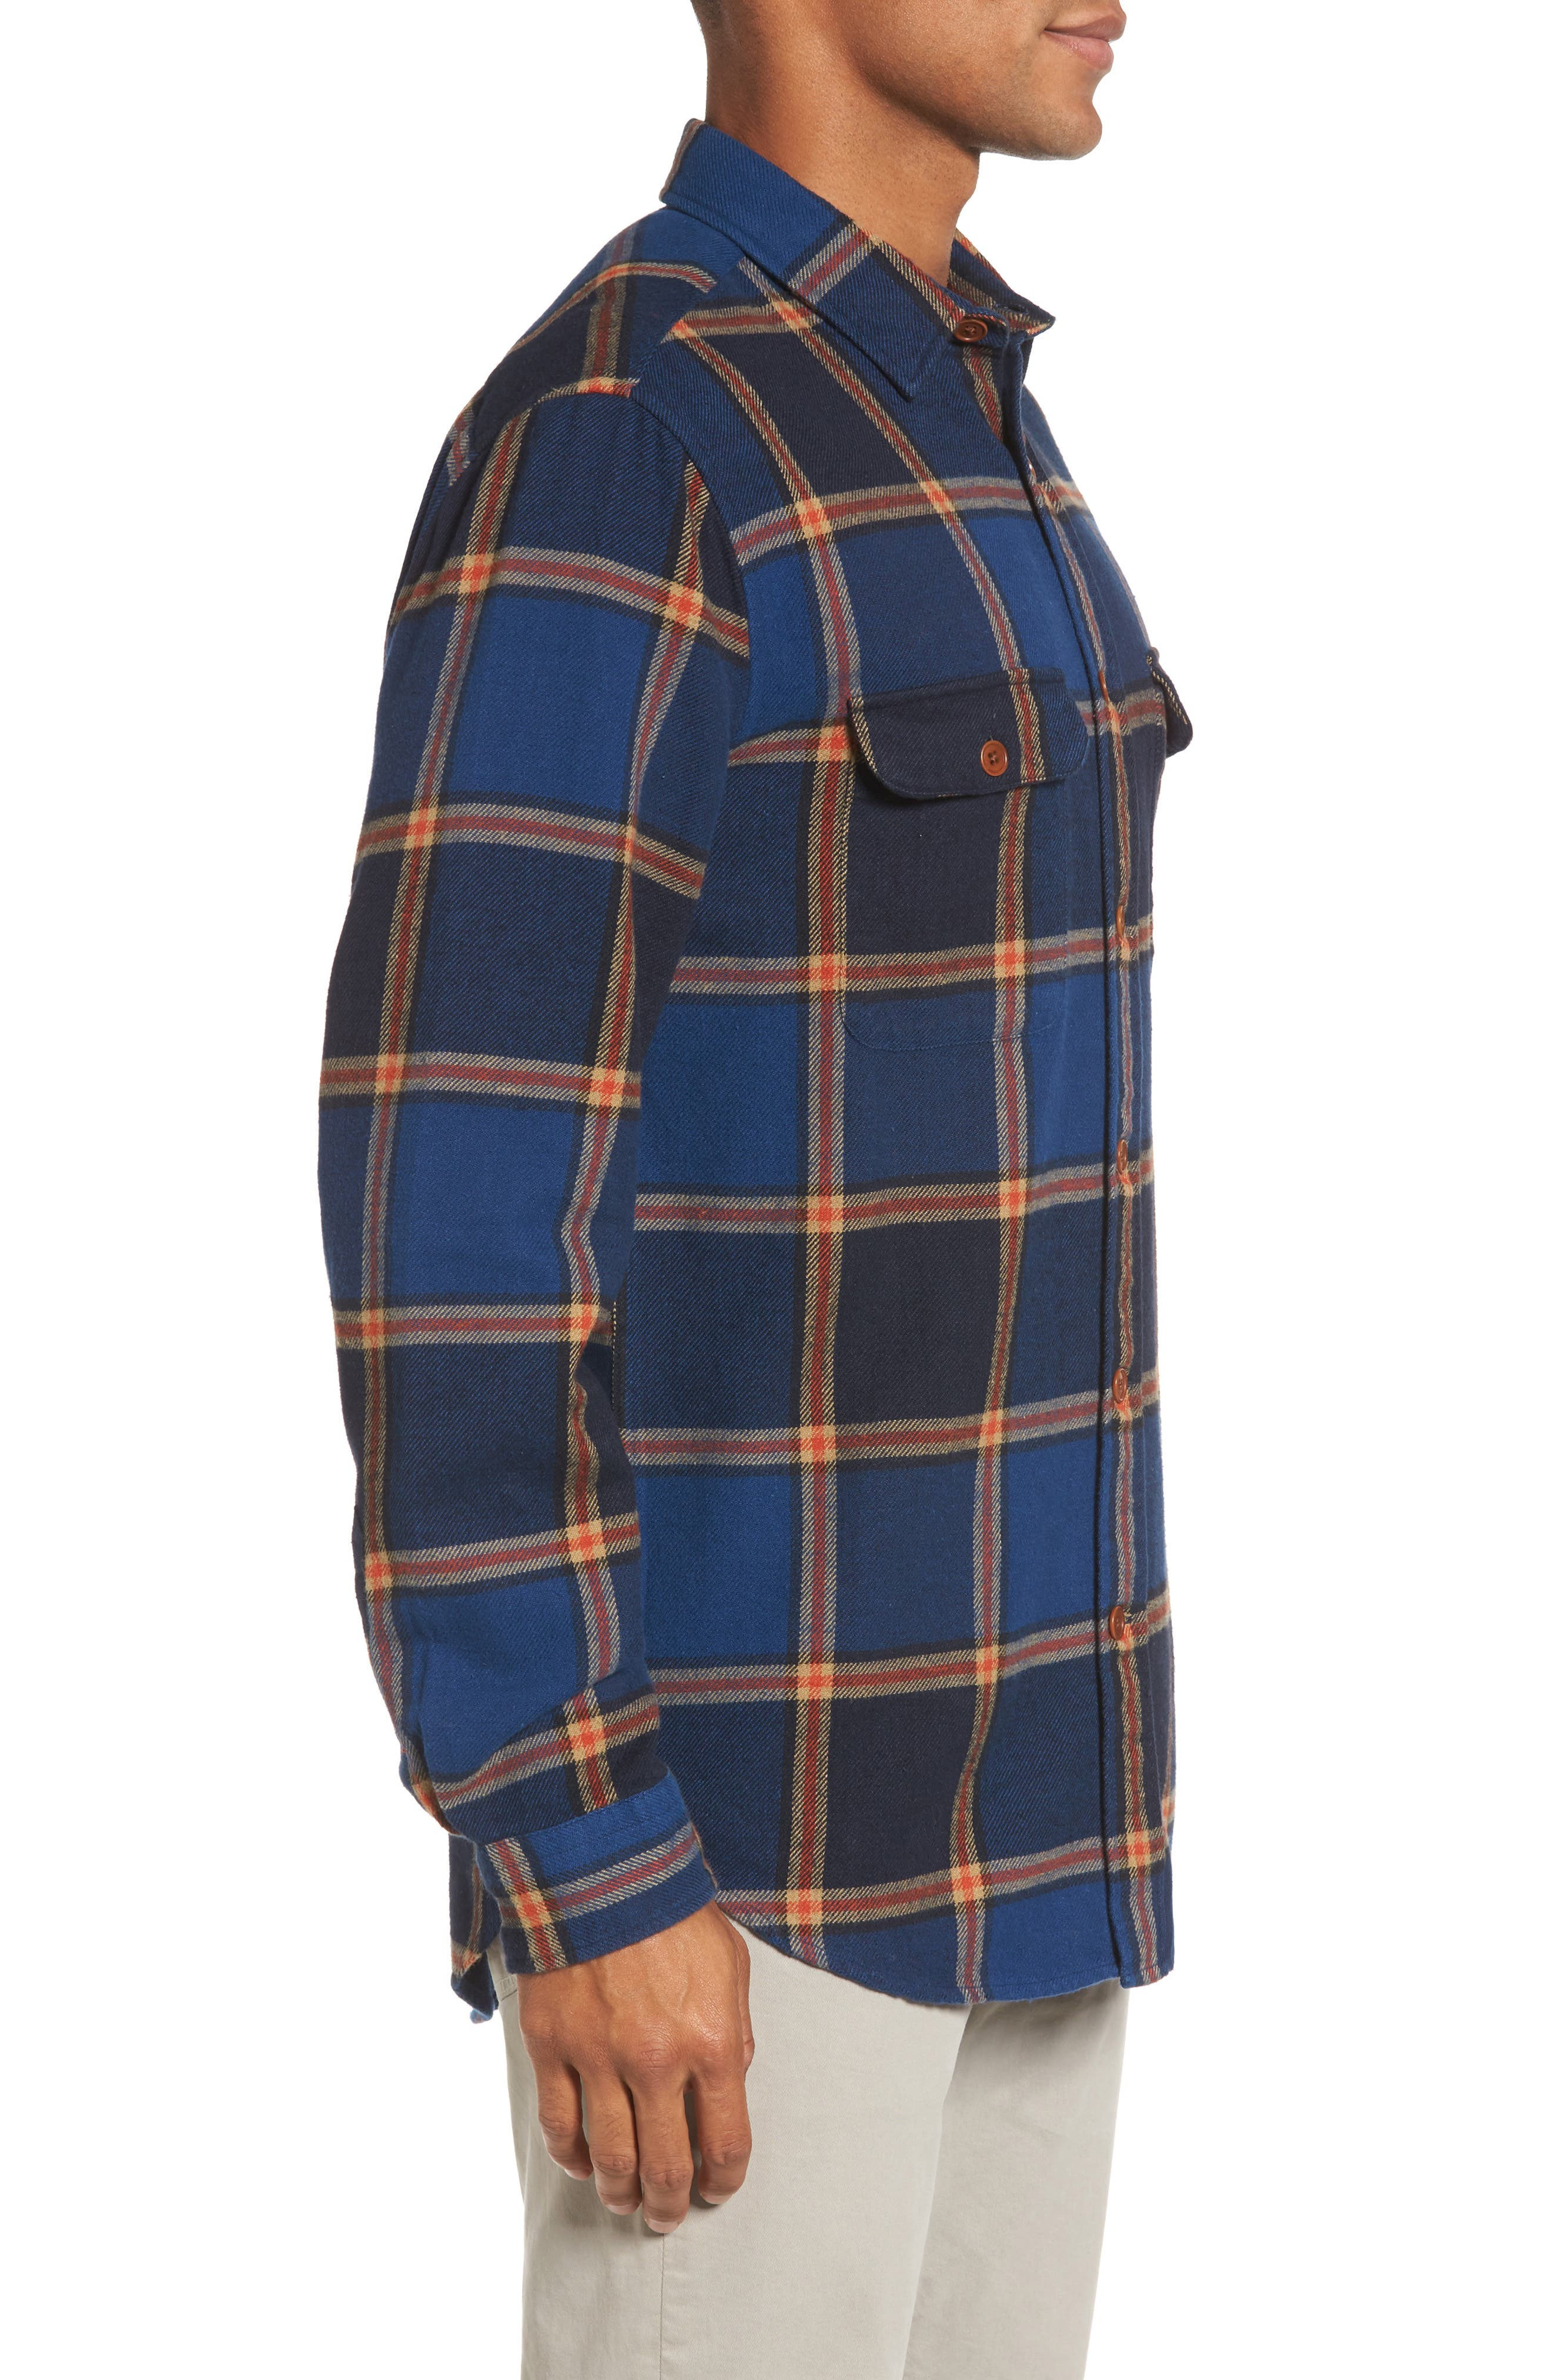 R1 Check Twill Shirt Jacket,                             Alternate thumbnail 3, color,                             410